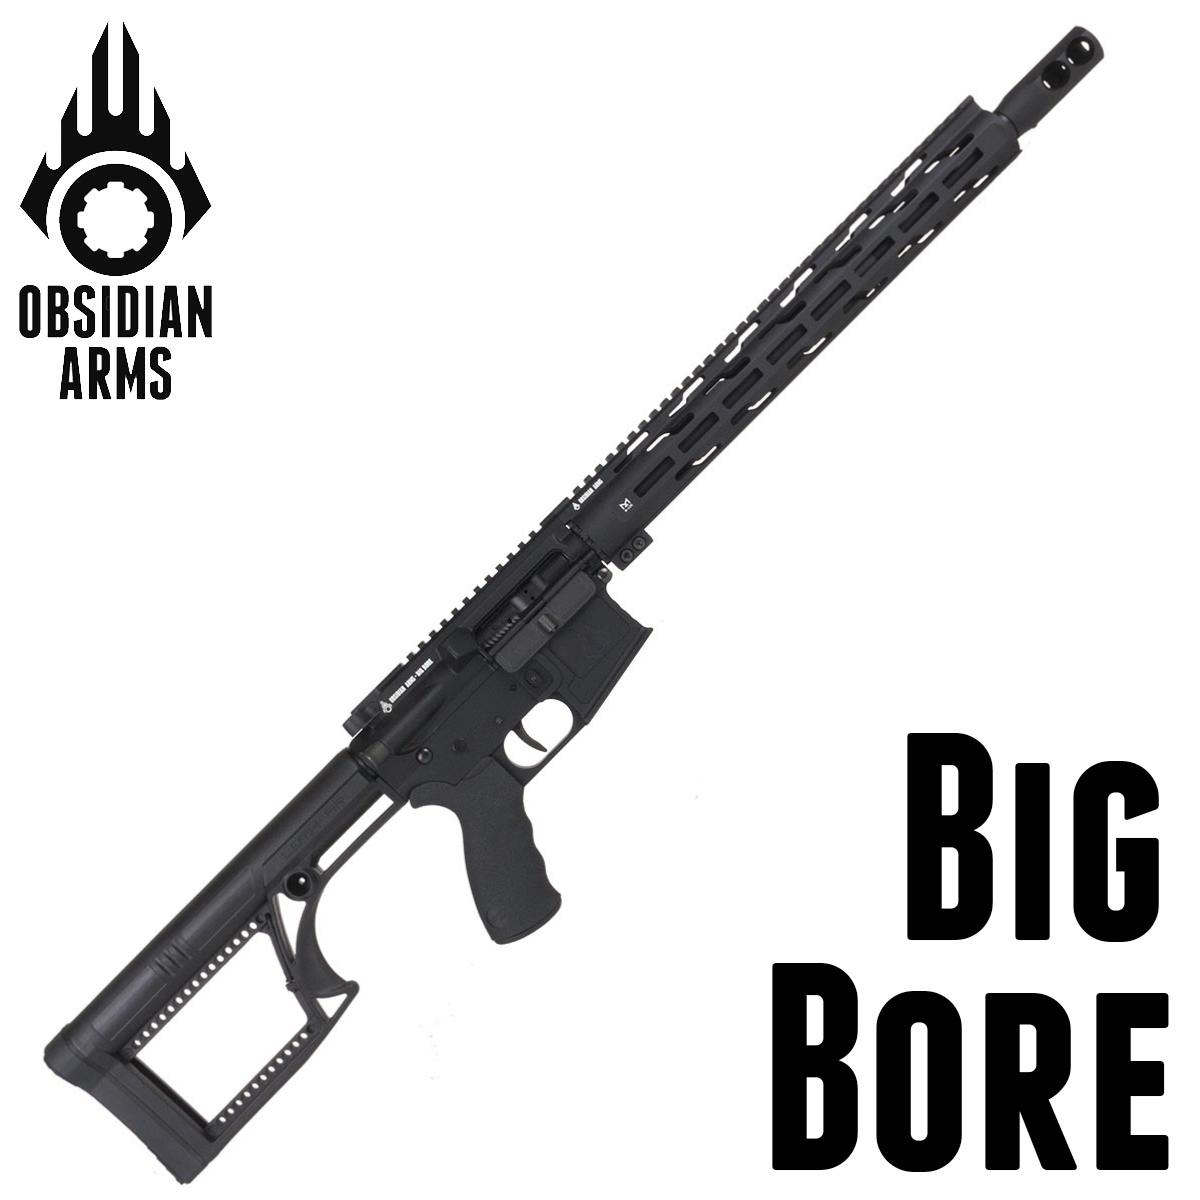 Obsidian Arms Big Bore Rifle